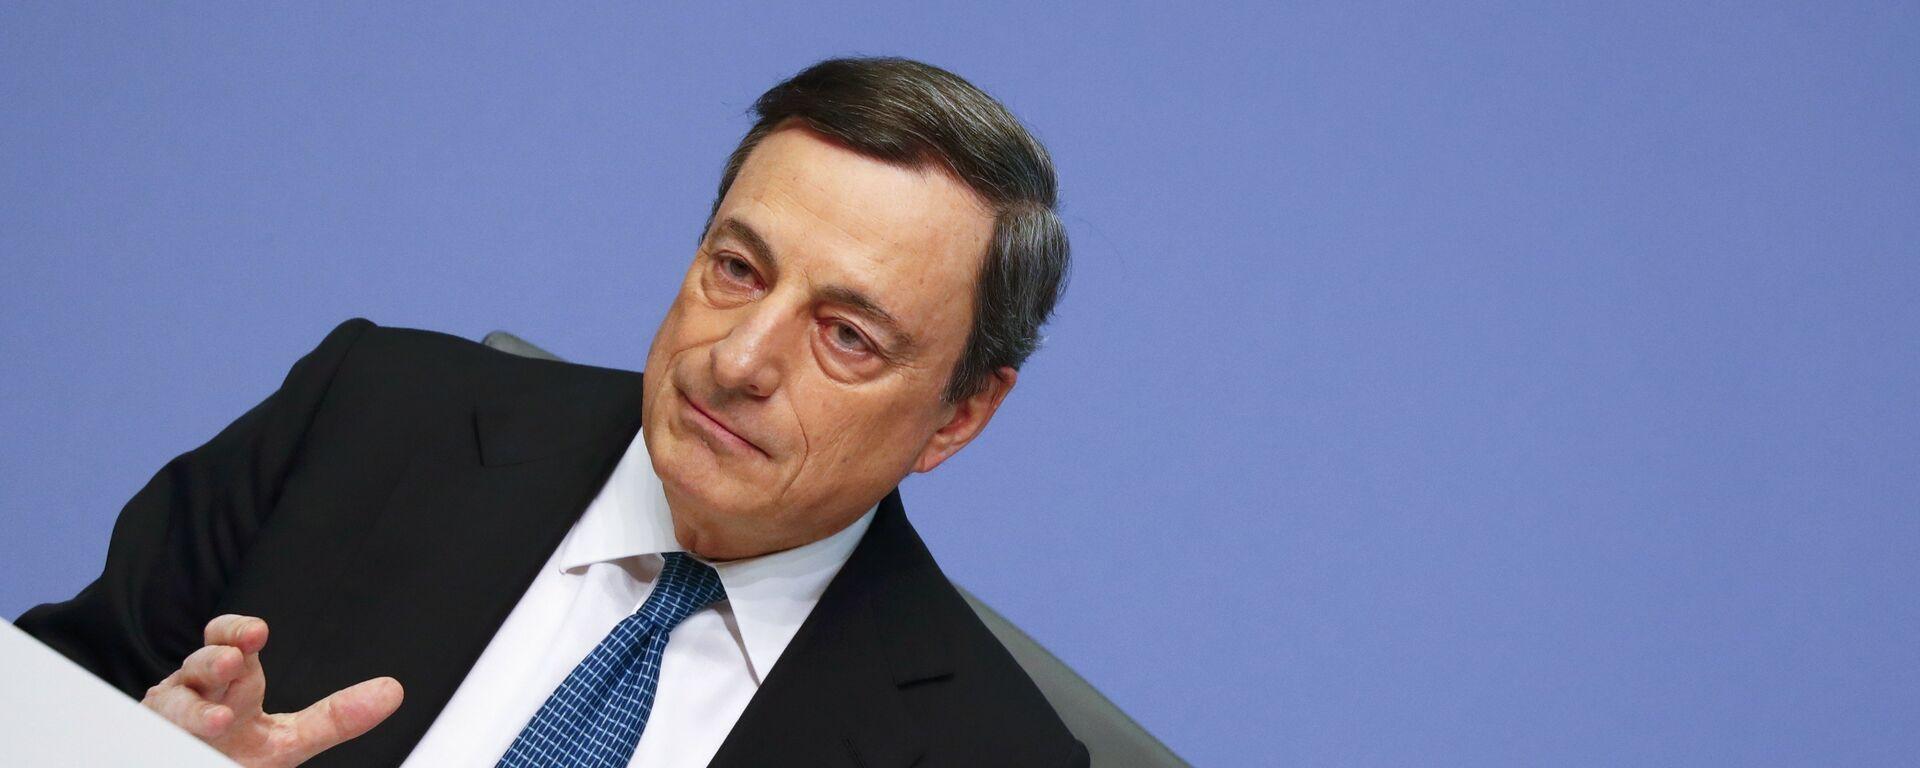 Mario Draghi - Sputnik Italia, 1920, 12.04.2021